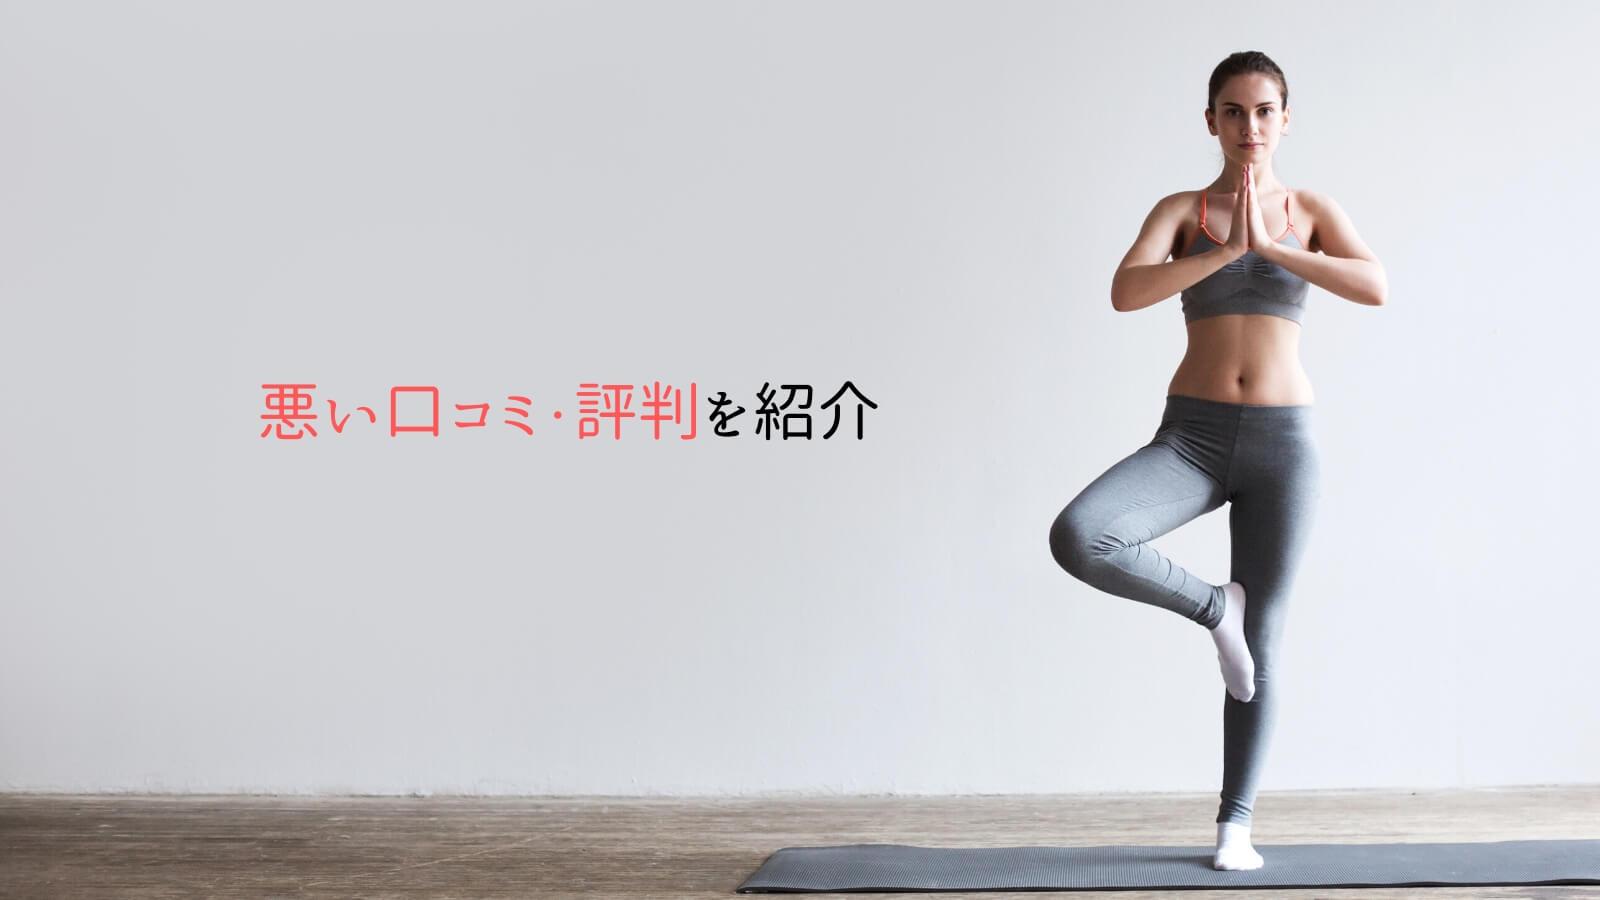 zen place pilates by BASI Pilatesの悪い口コミ・評判を紹介